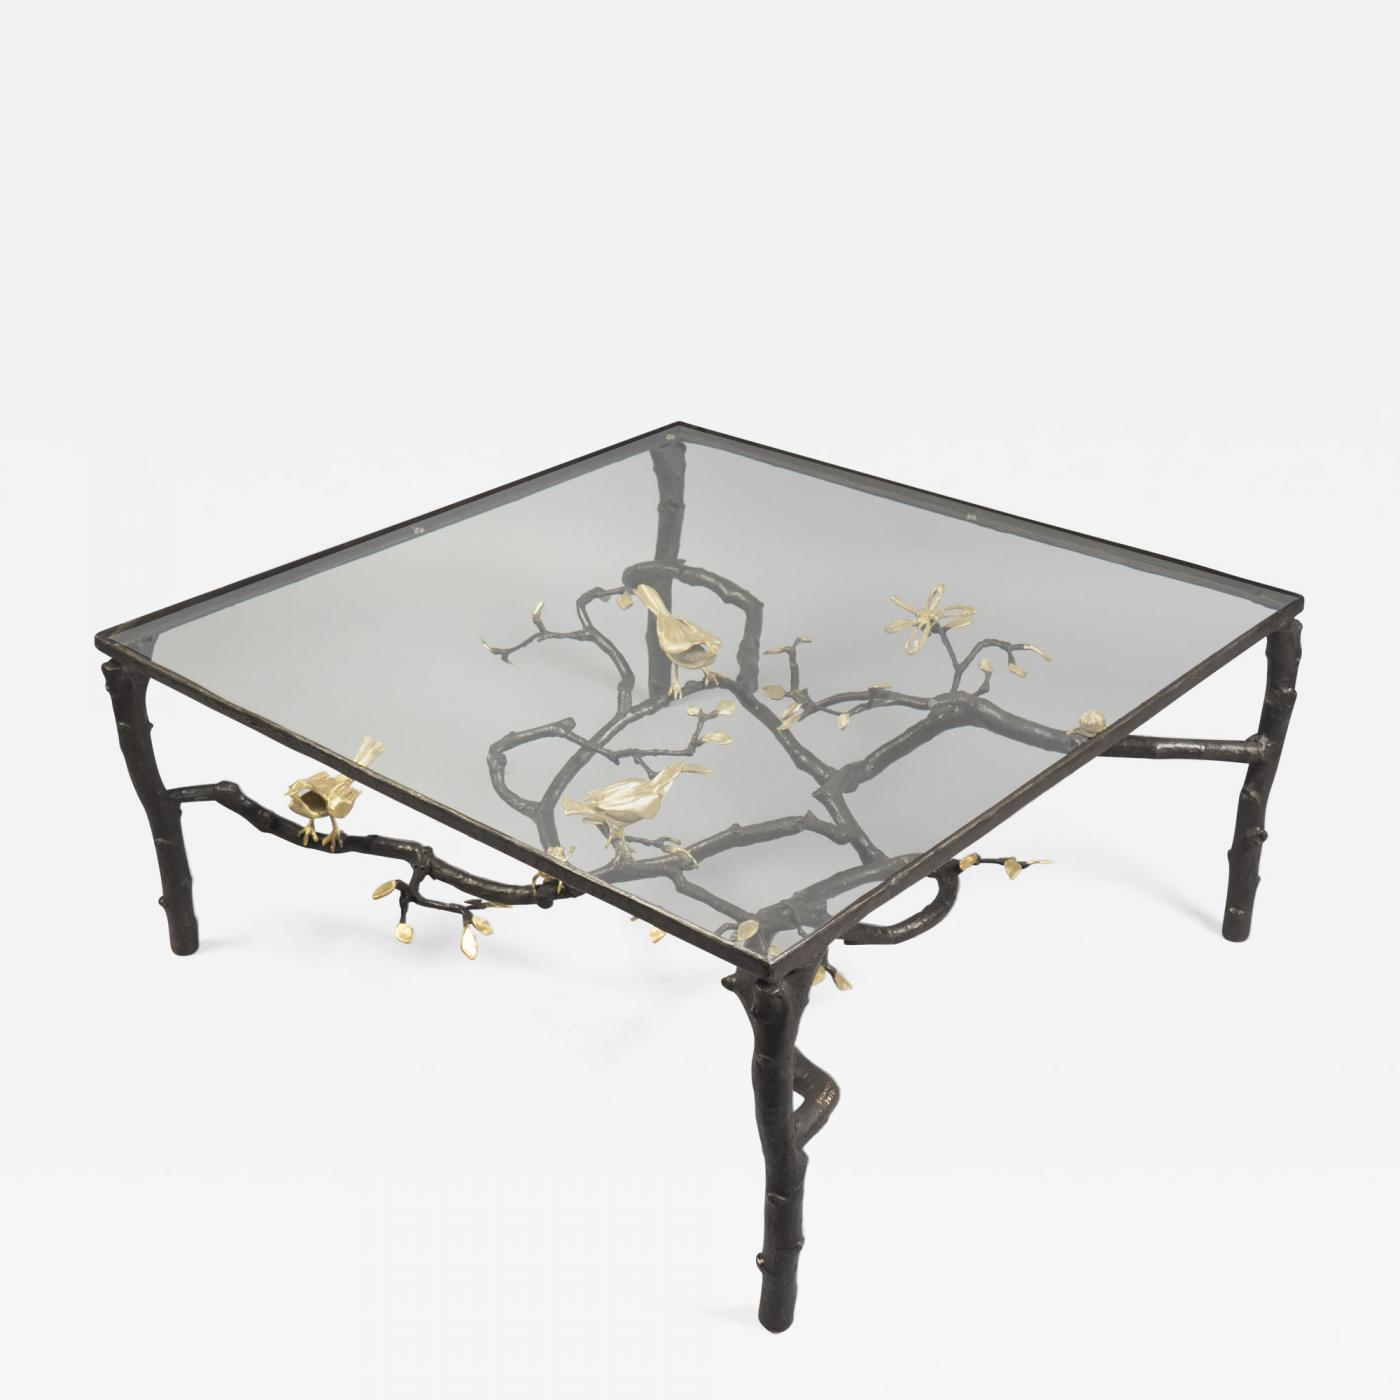 Listings furniture tables coffee tables · paula swinnen wrought iron